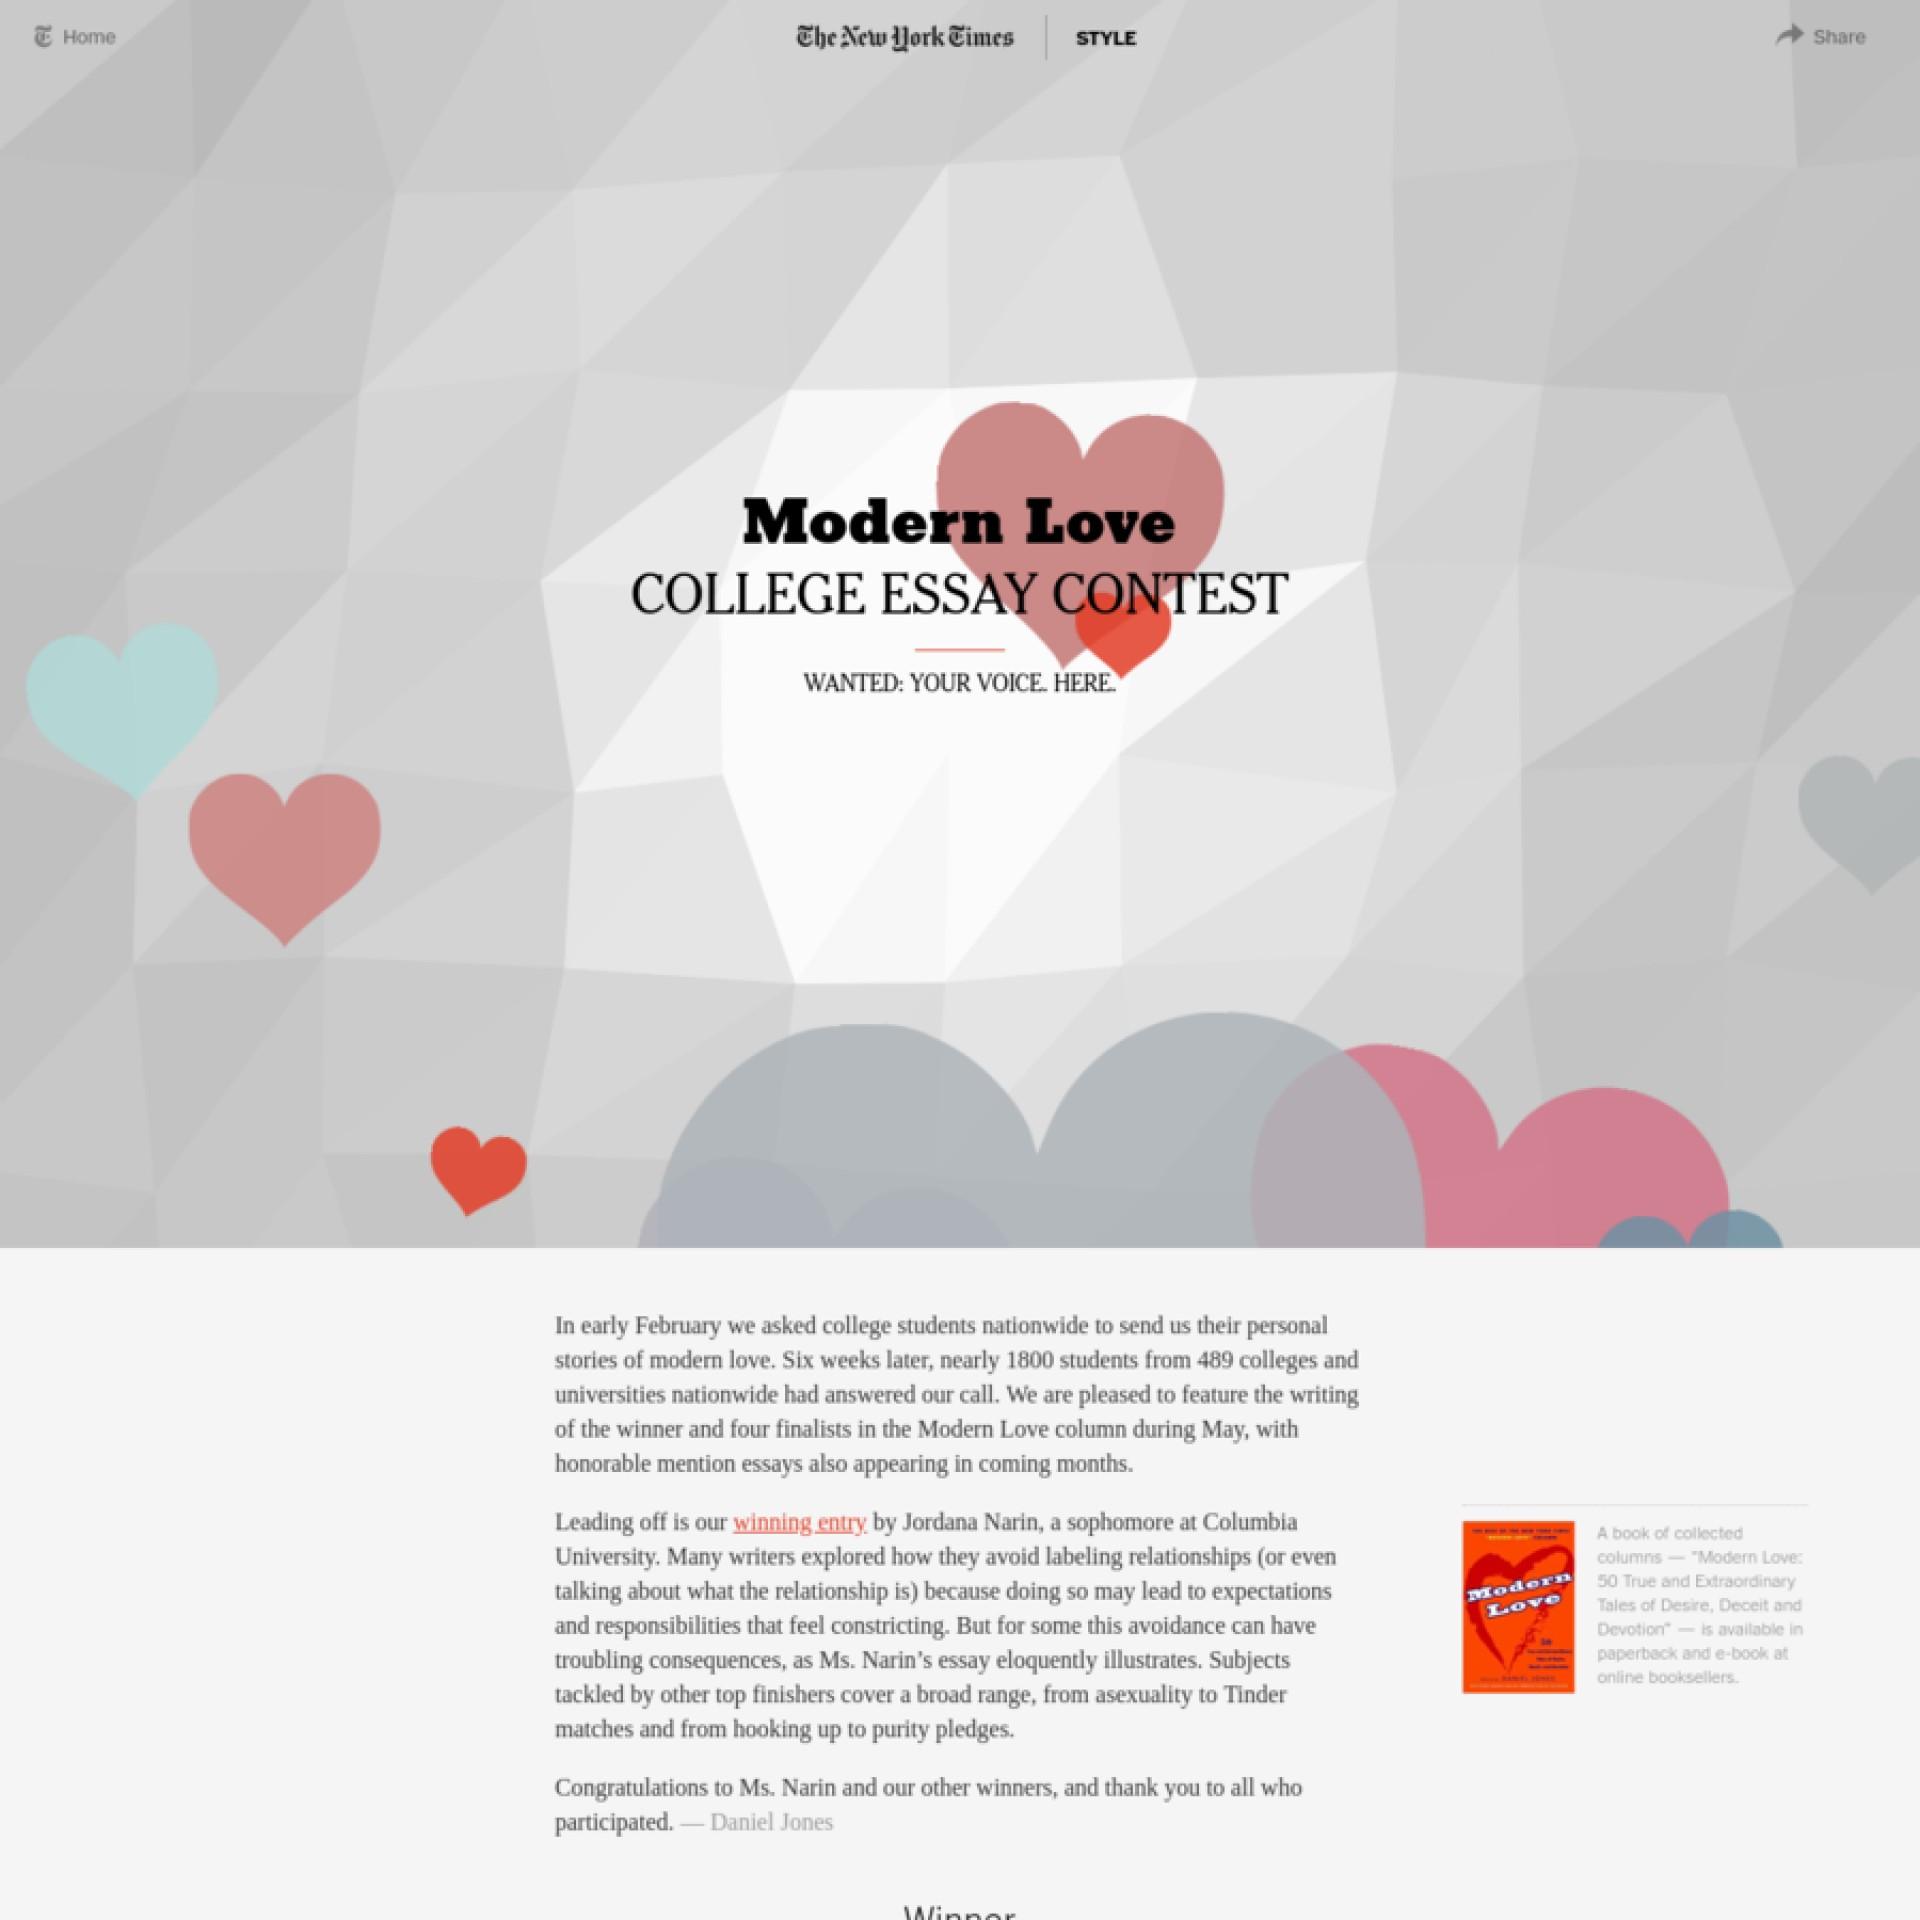 005 Large 9c7cbb98d14cce0731e1794ebb29986f1534592219 Modern Love College Essay Contest Impressive 2016 1920